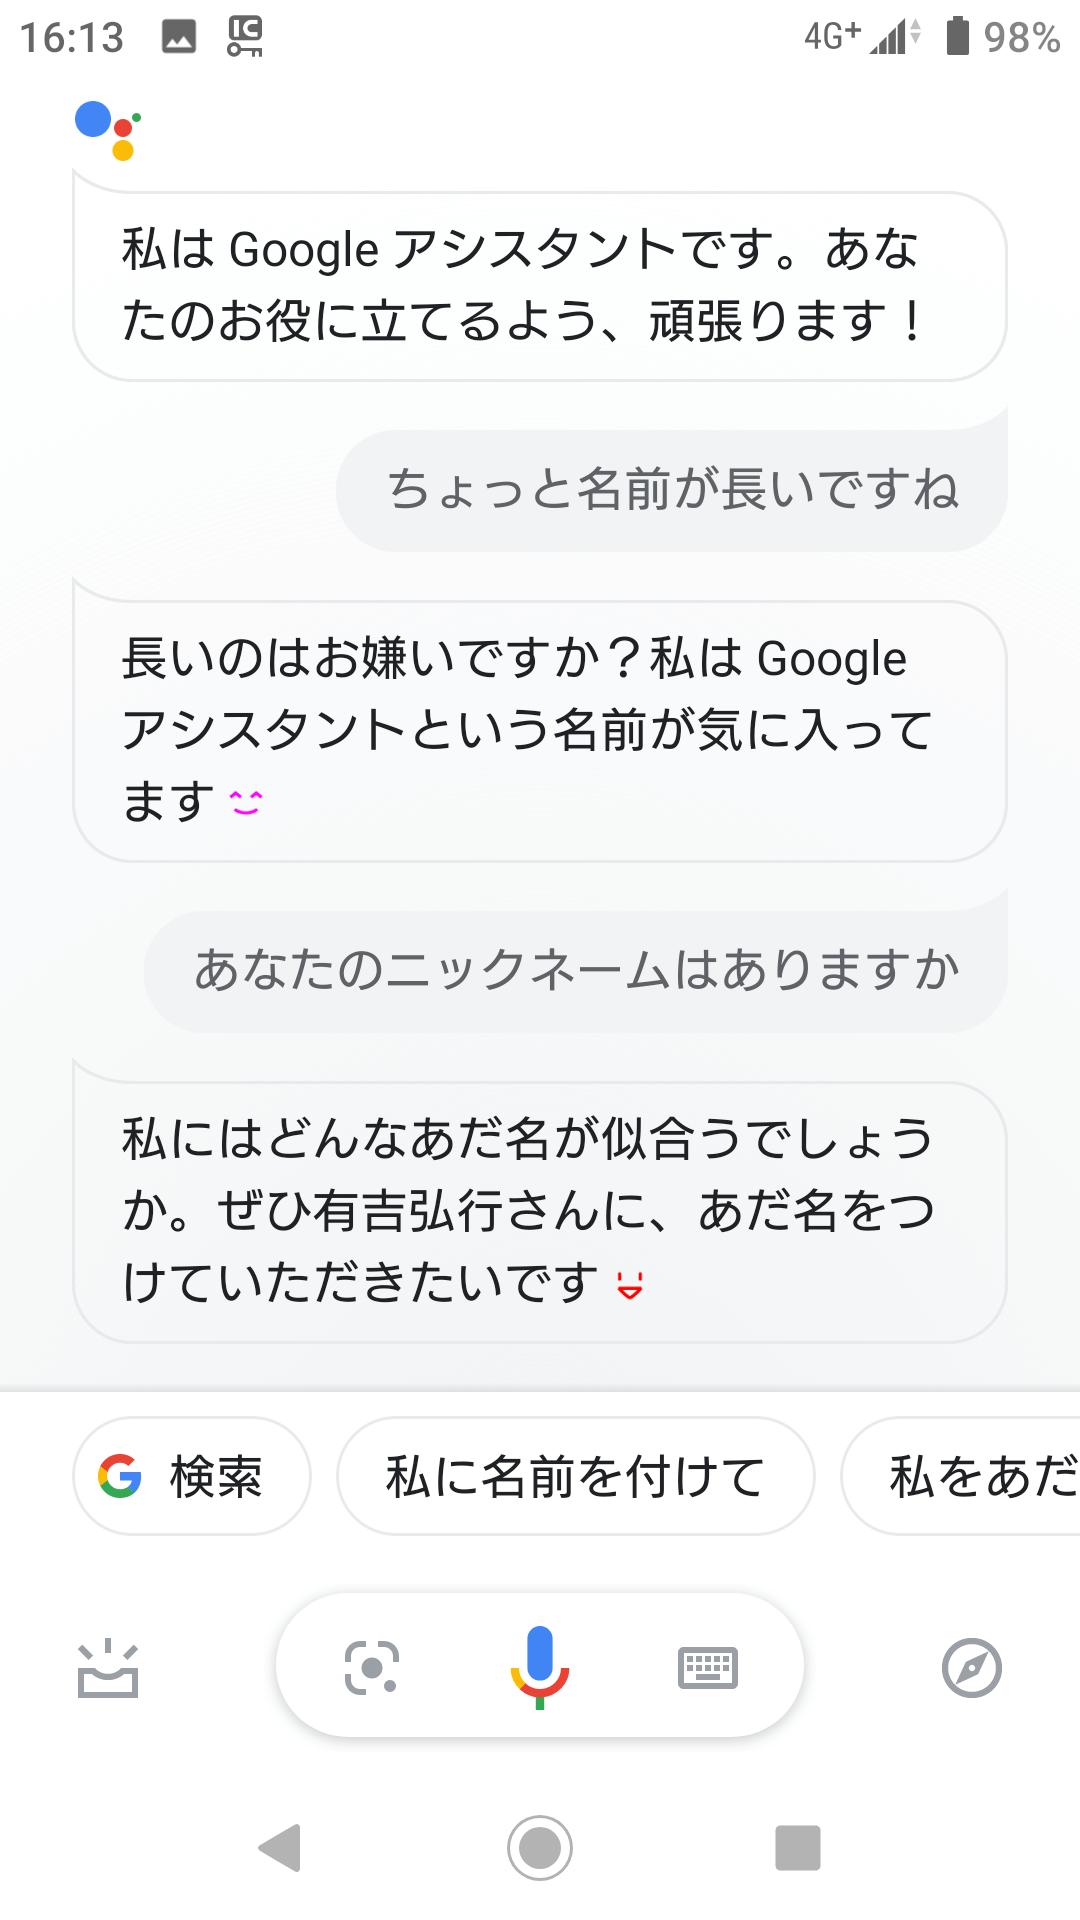 Google アシスタント 会話